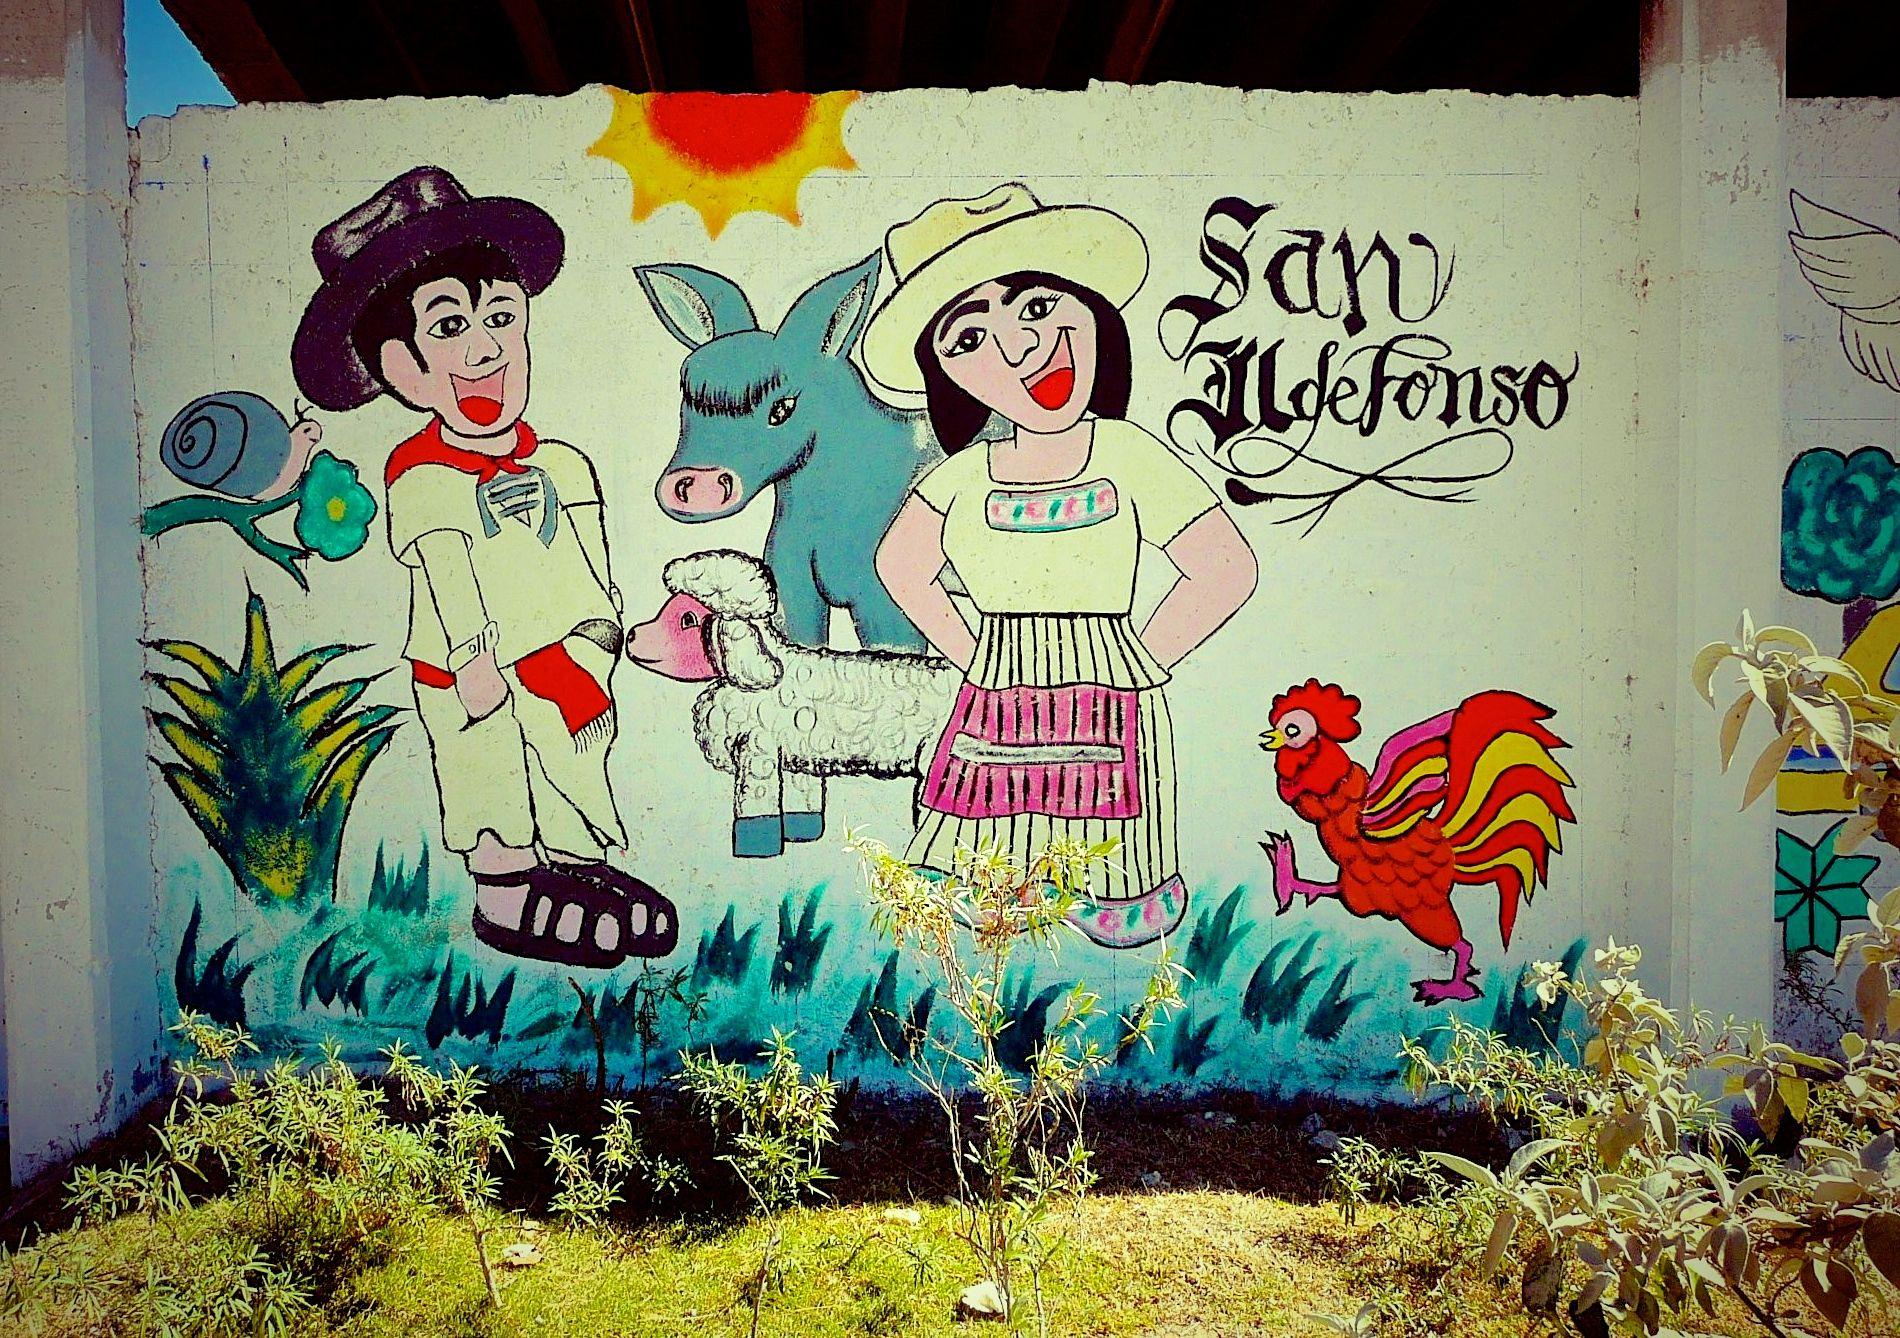 Wandbemalung in der Stadt San Ildefonso